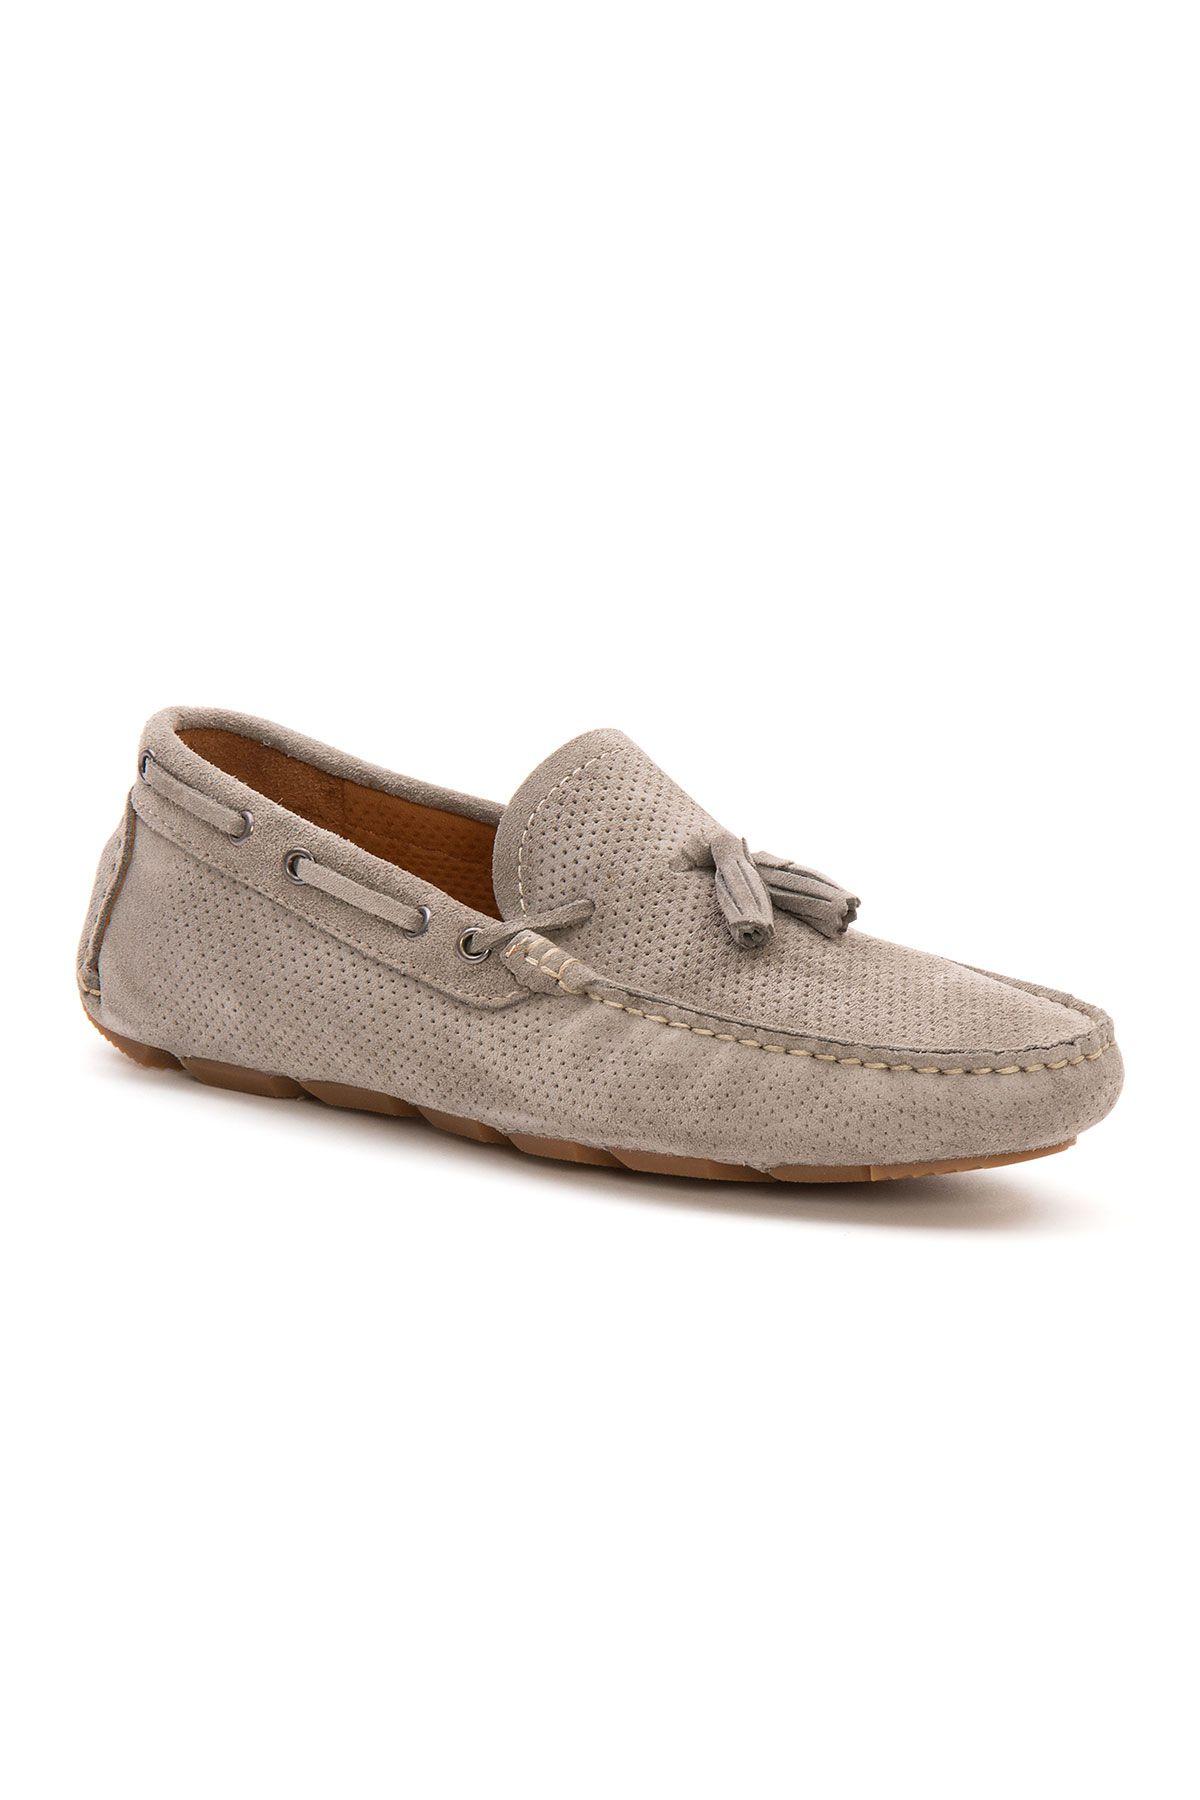 Pegia Genuine Suede Men's Tassel Loafer 500903 Gray